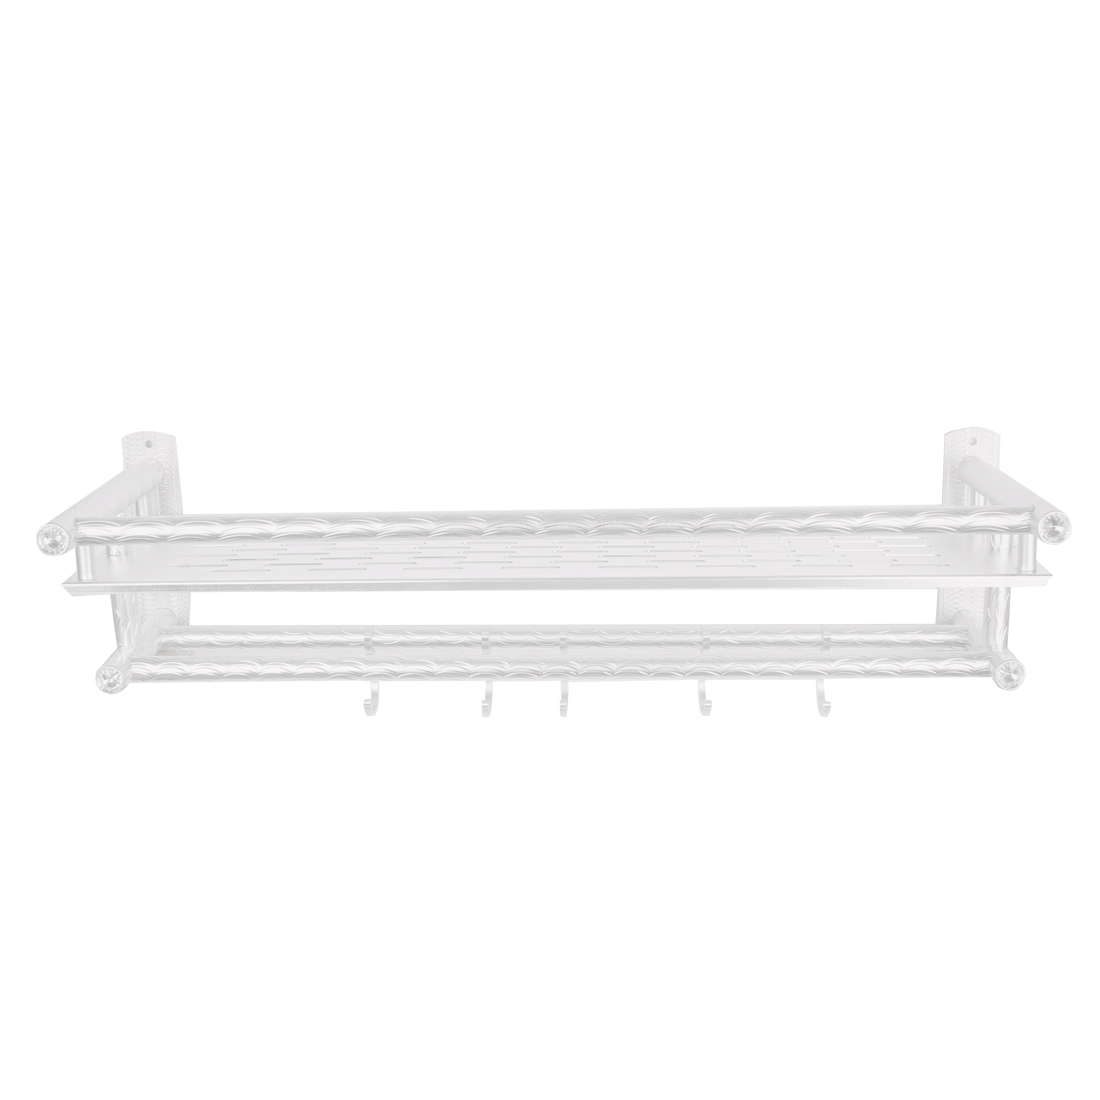 Rhinestone Decor Hollow Out Design Aluminum 5 Hooks 2 Layers Towel Shelf